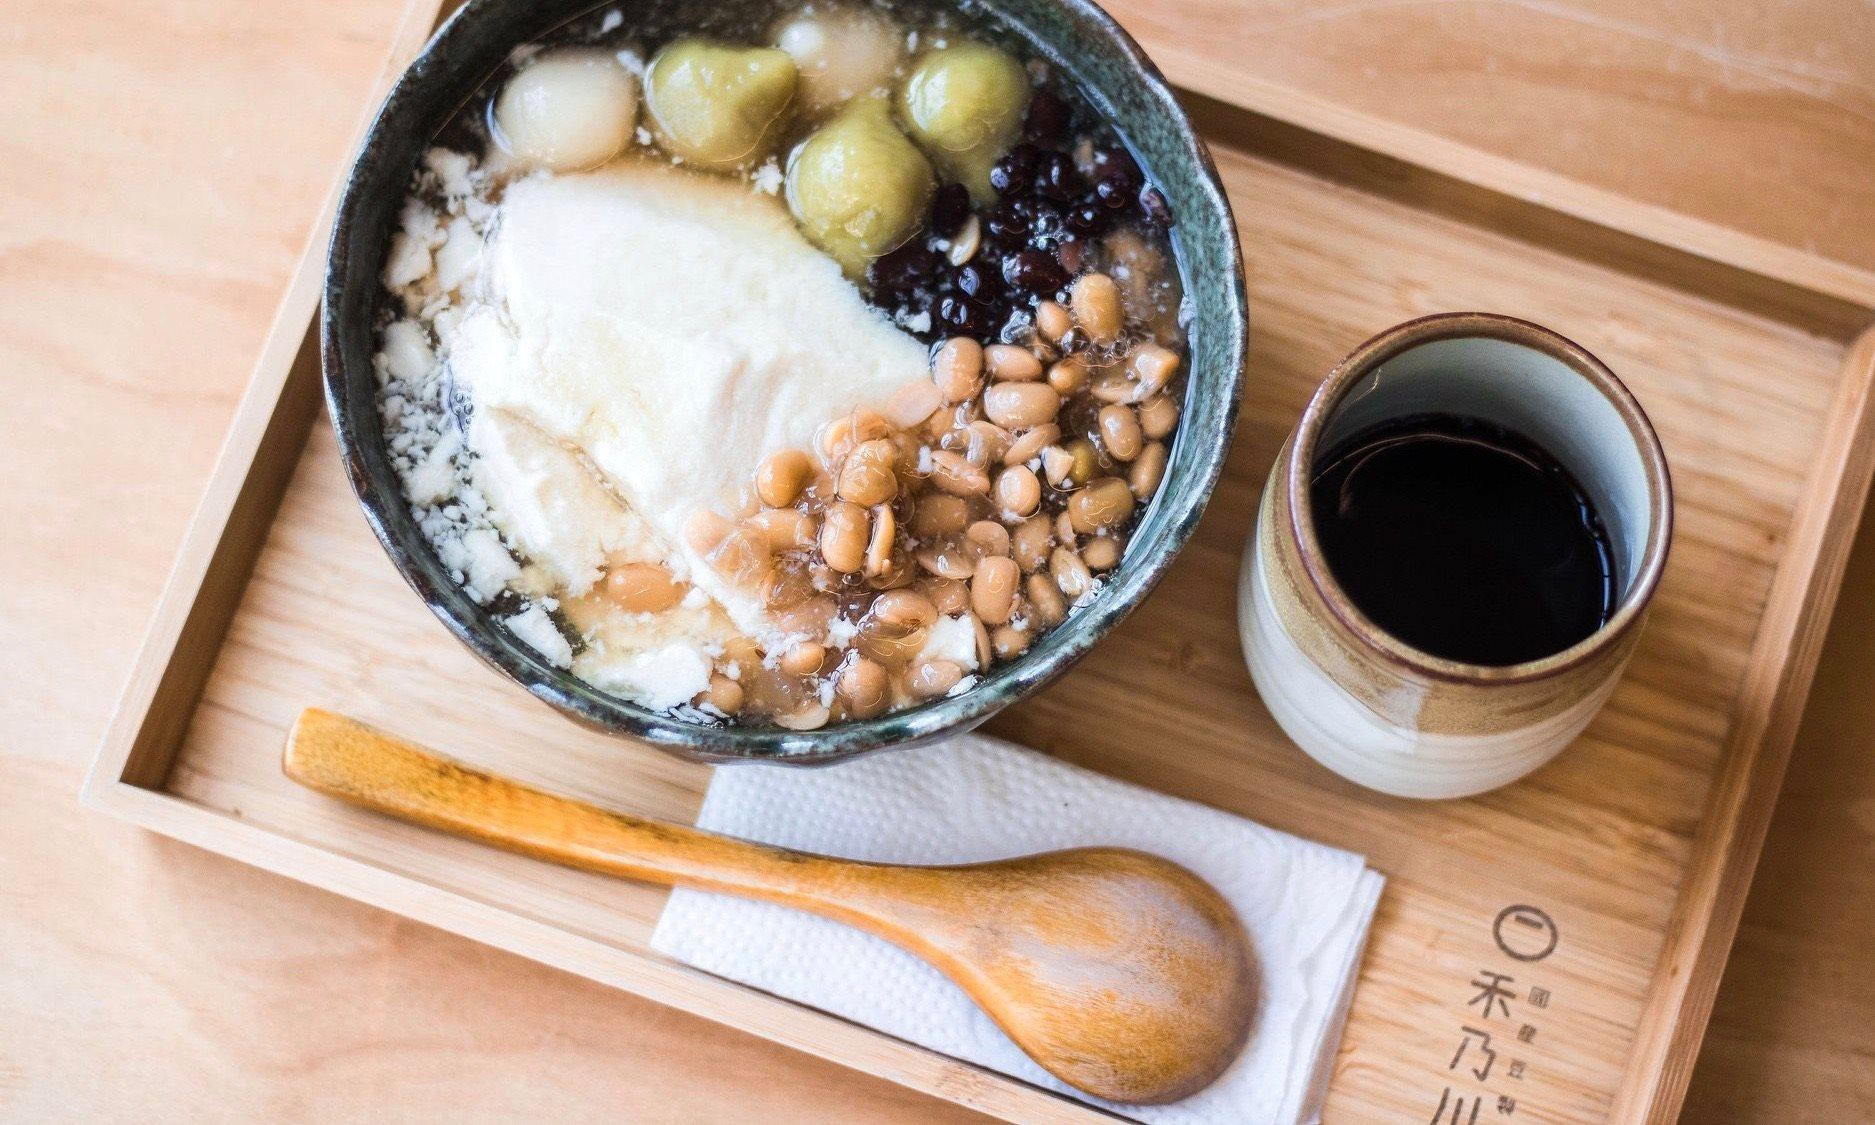 HIDEKAWA Domestic Soybean Products